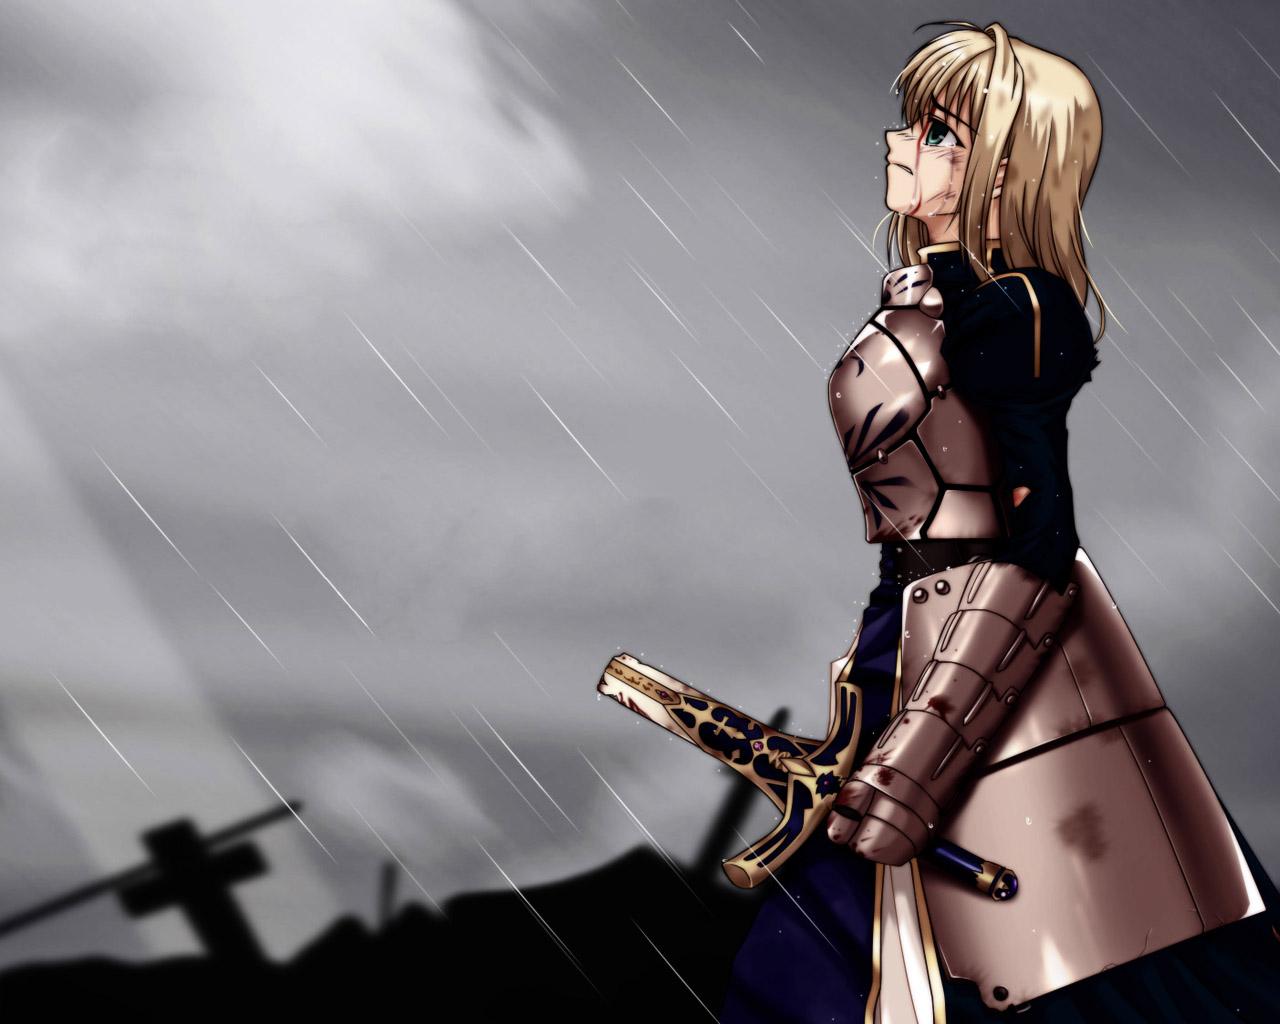 artoria_pendragon_(all) blood fate_(series) fate/stay_night rain saber sword water weapon